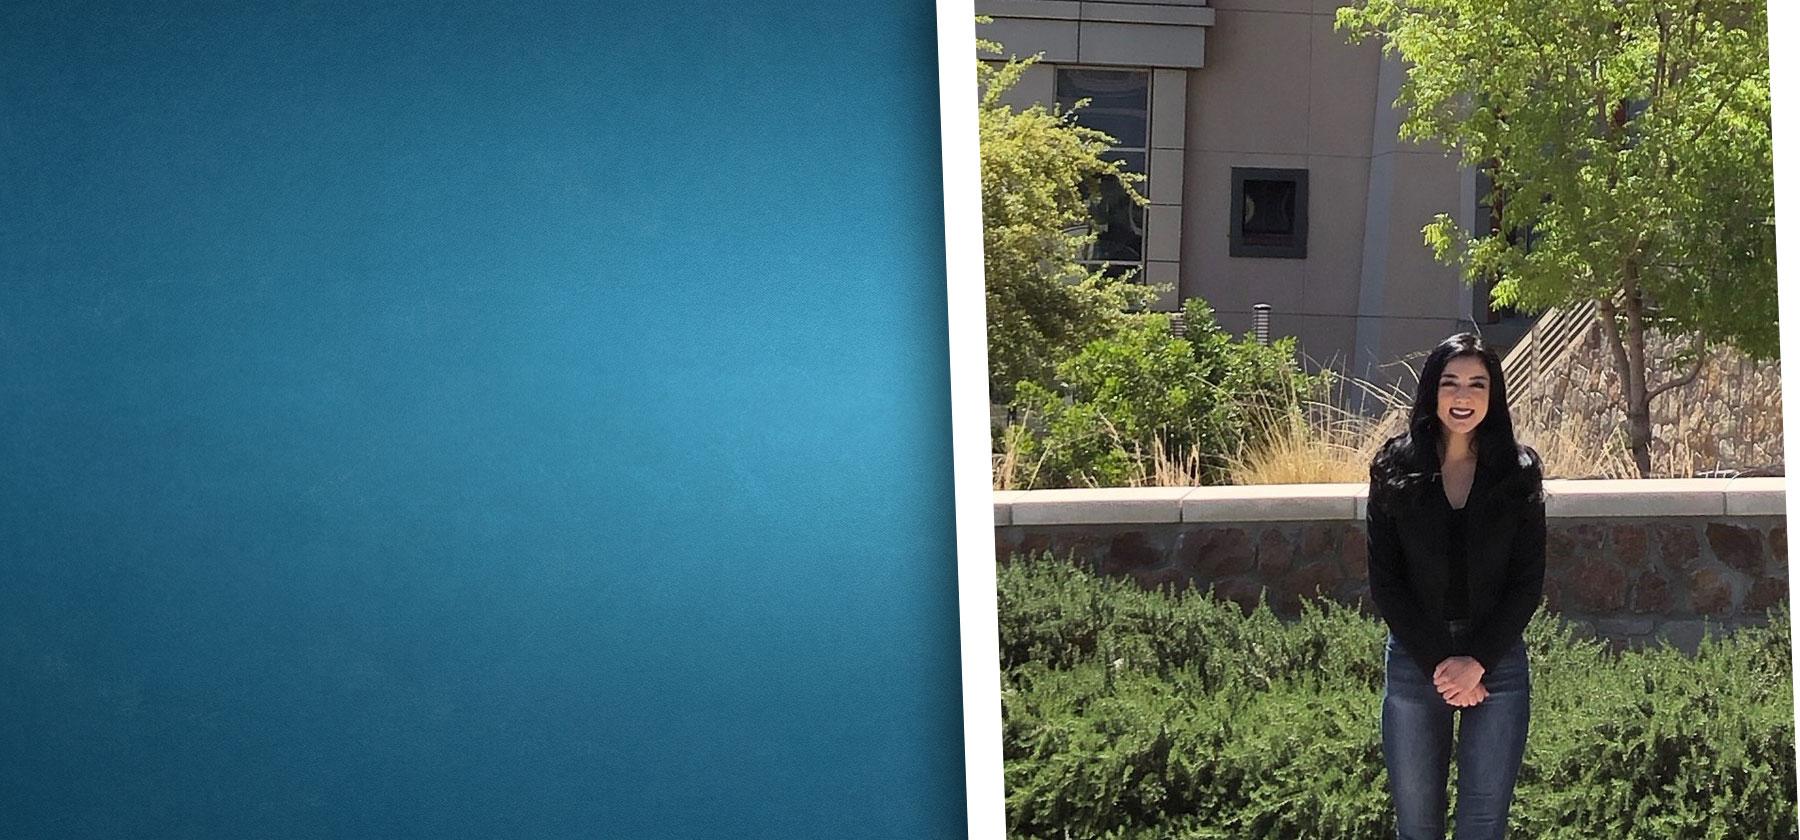 Speech Language Pathology - University of Texas at El Paso